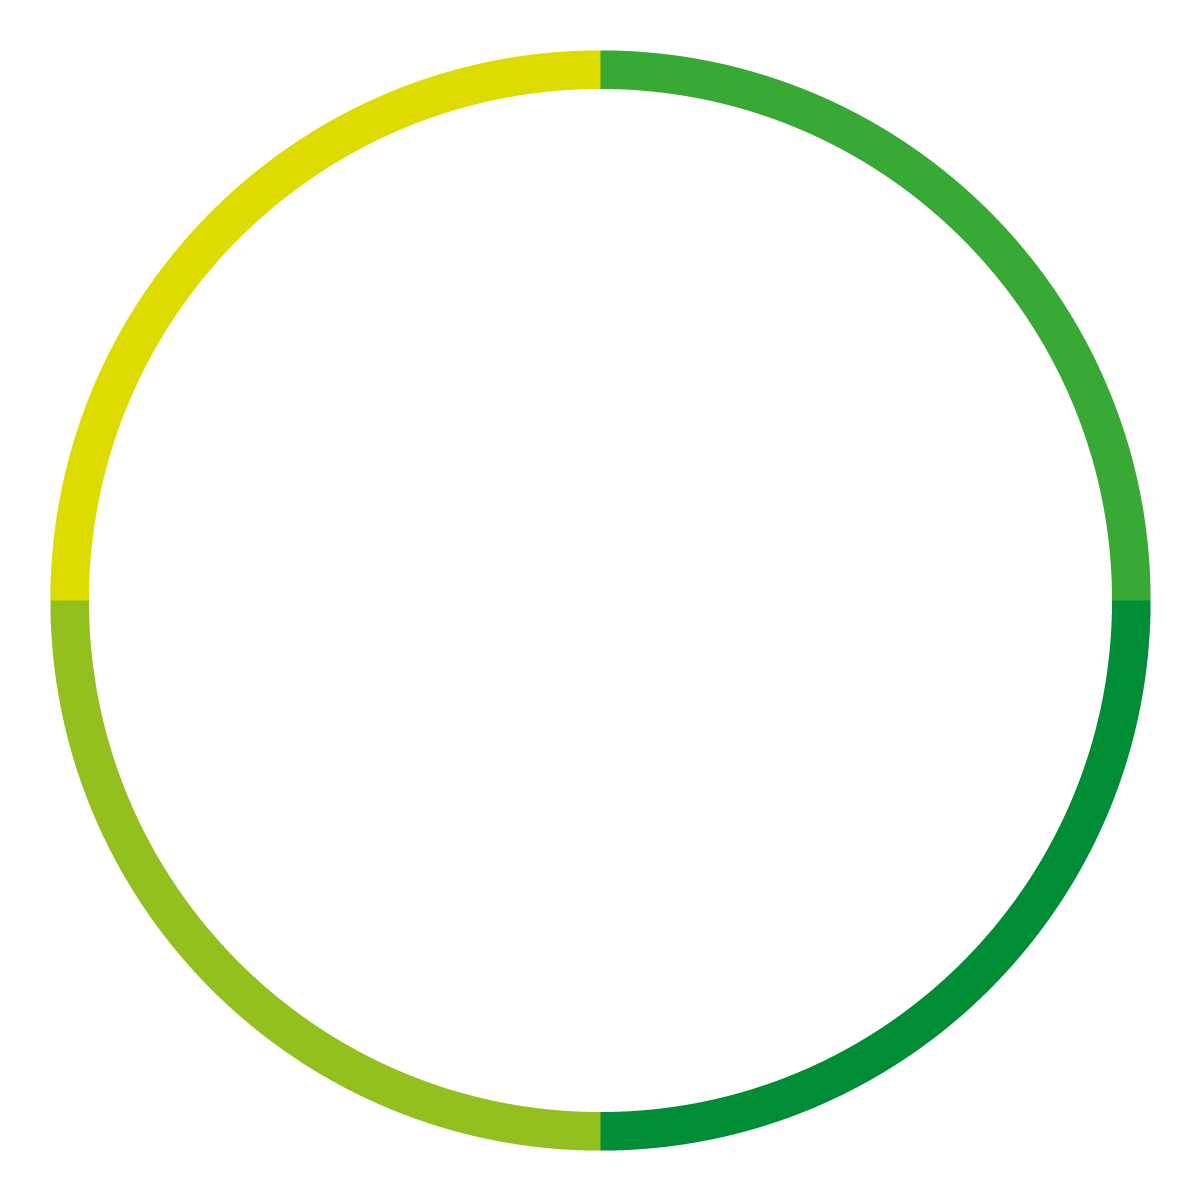 Scrap Car Network - 310% Increase In Organic Traffic